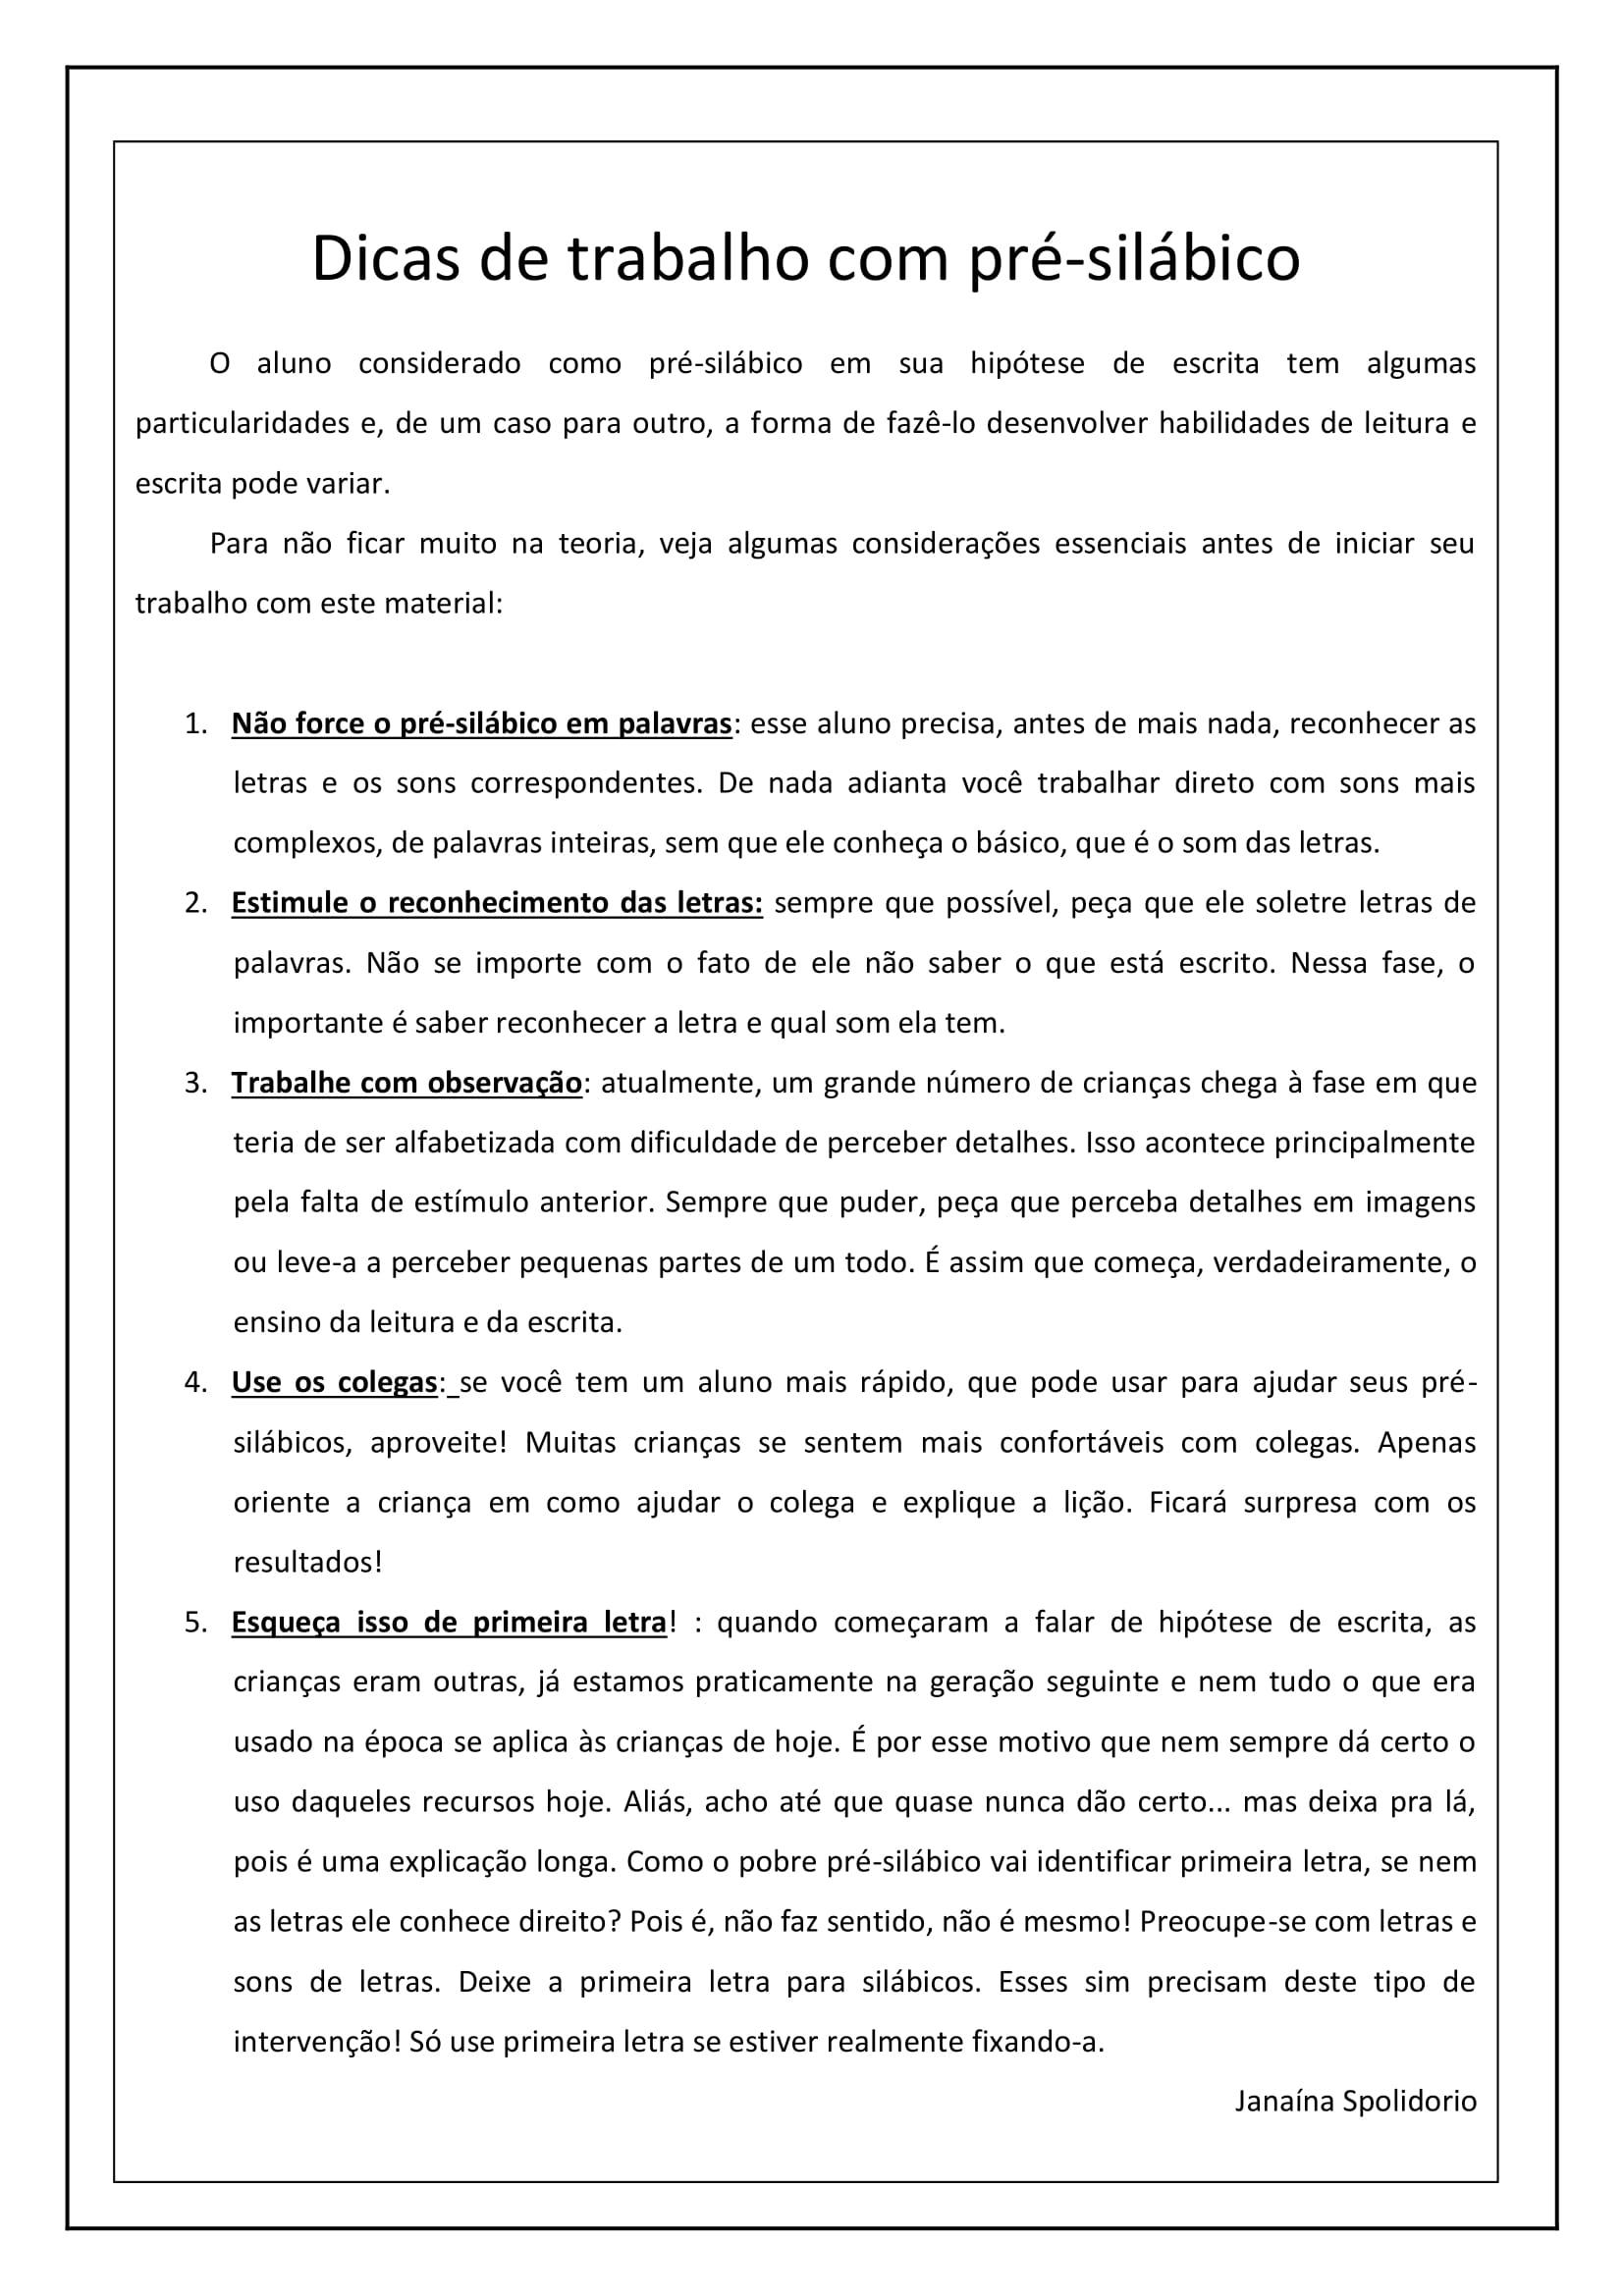 Imprimir_atividades_para_pre_silabicos-02